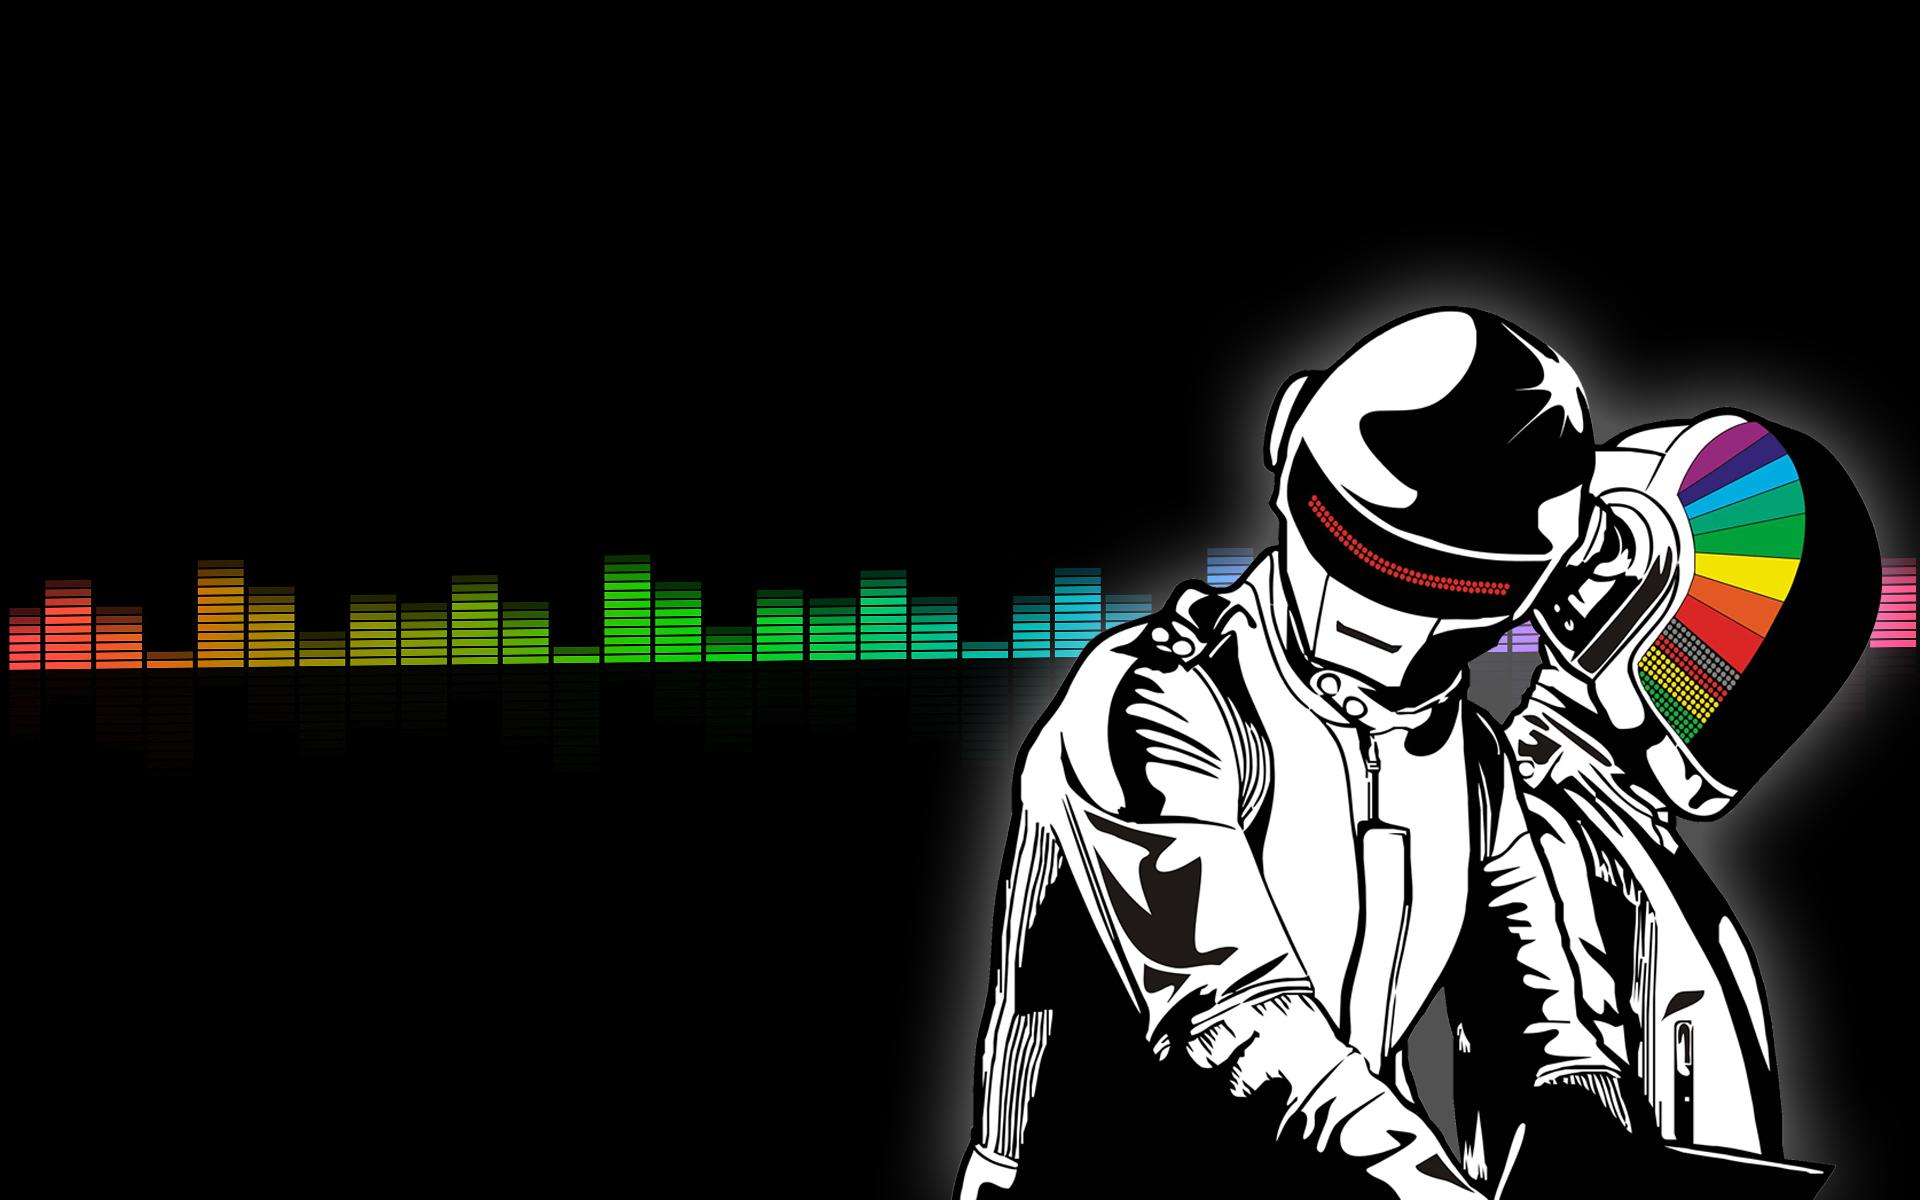 графика dubstep музыка  № 2880840 бесплатно